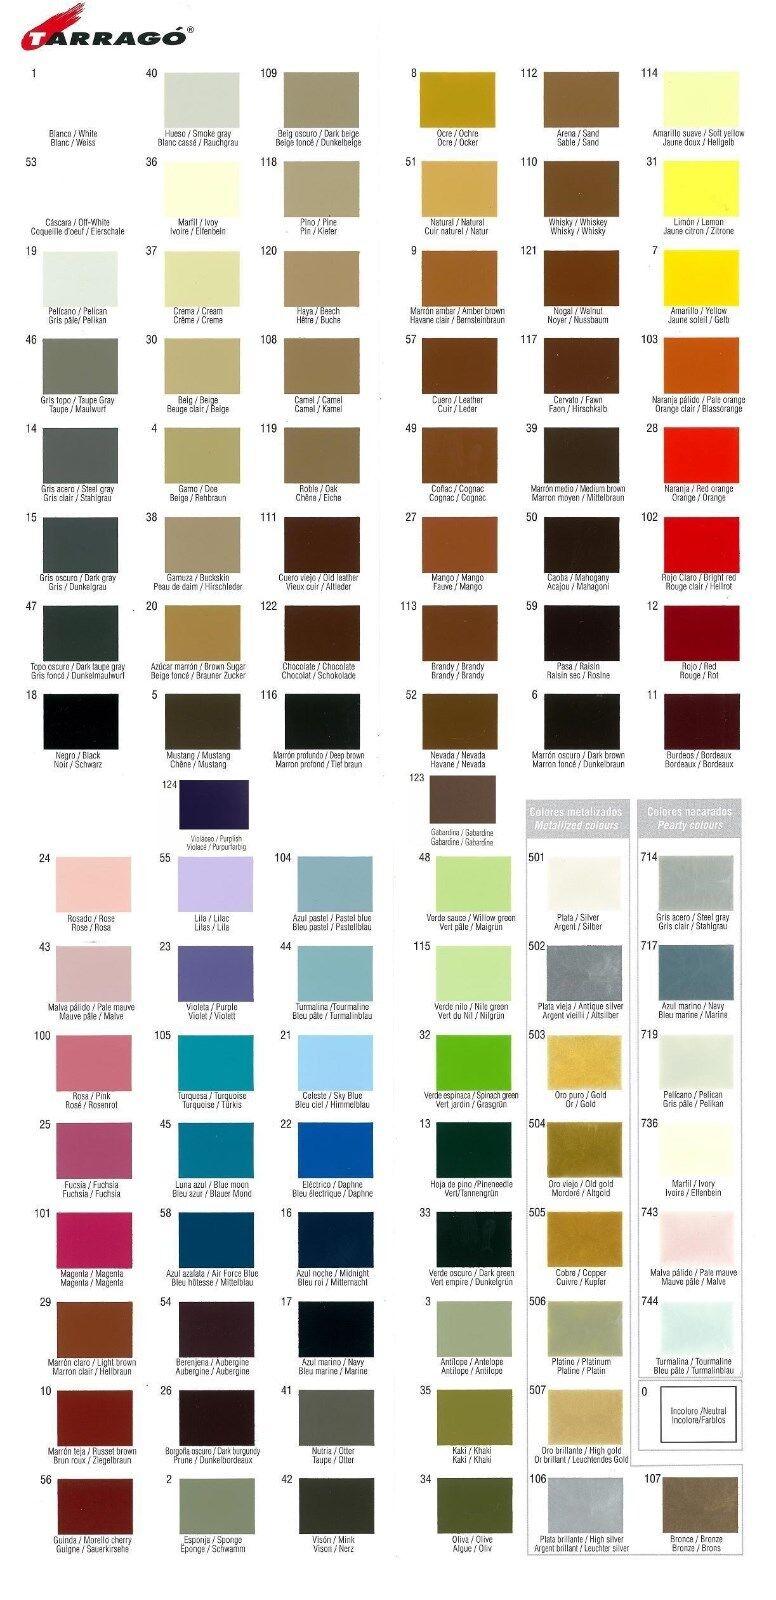 Tarrago Shoe Boot Cream Leather Polish Jar Cream 50ML (Many Colors) Clothing & Shoe Care